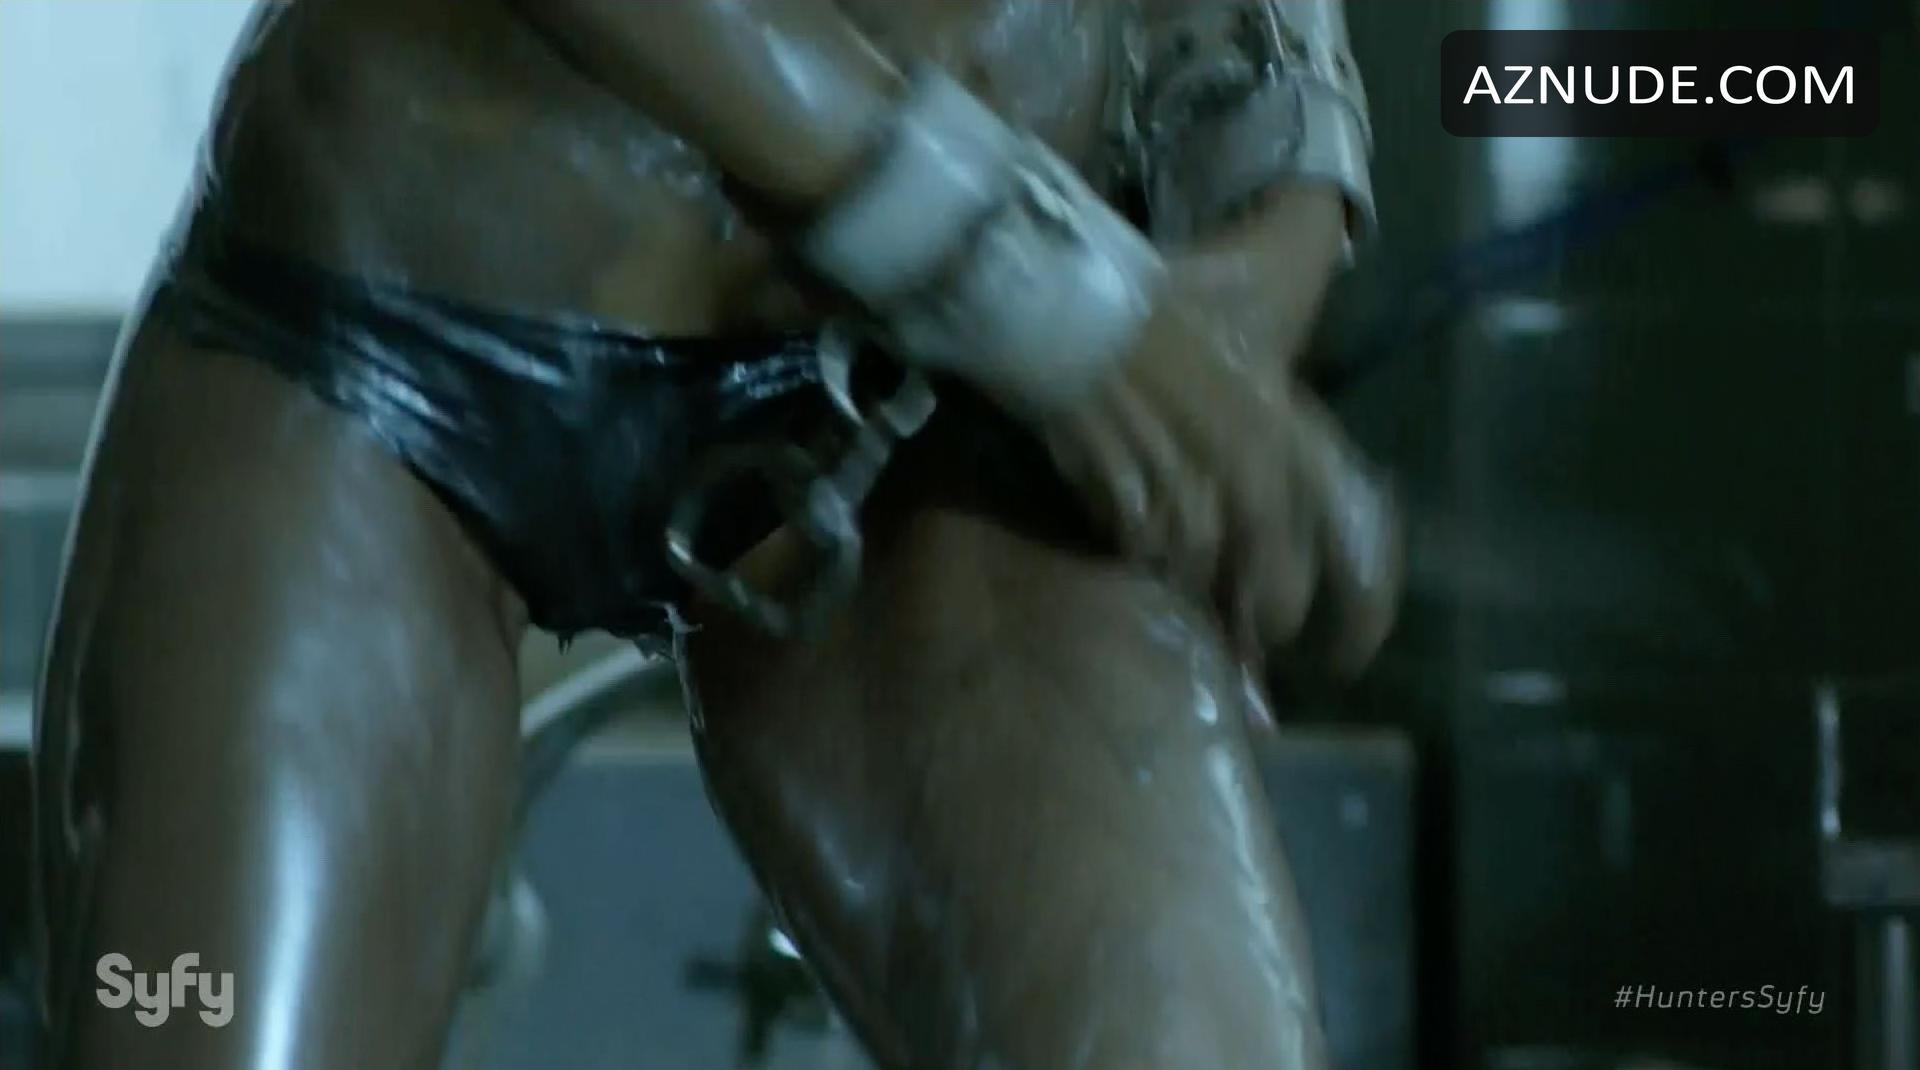 Britne Oldford Nude britne oldford nude - aznude